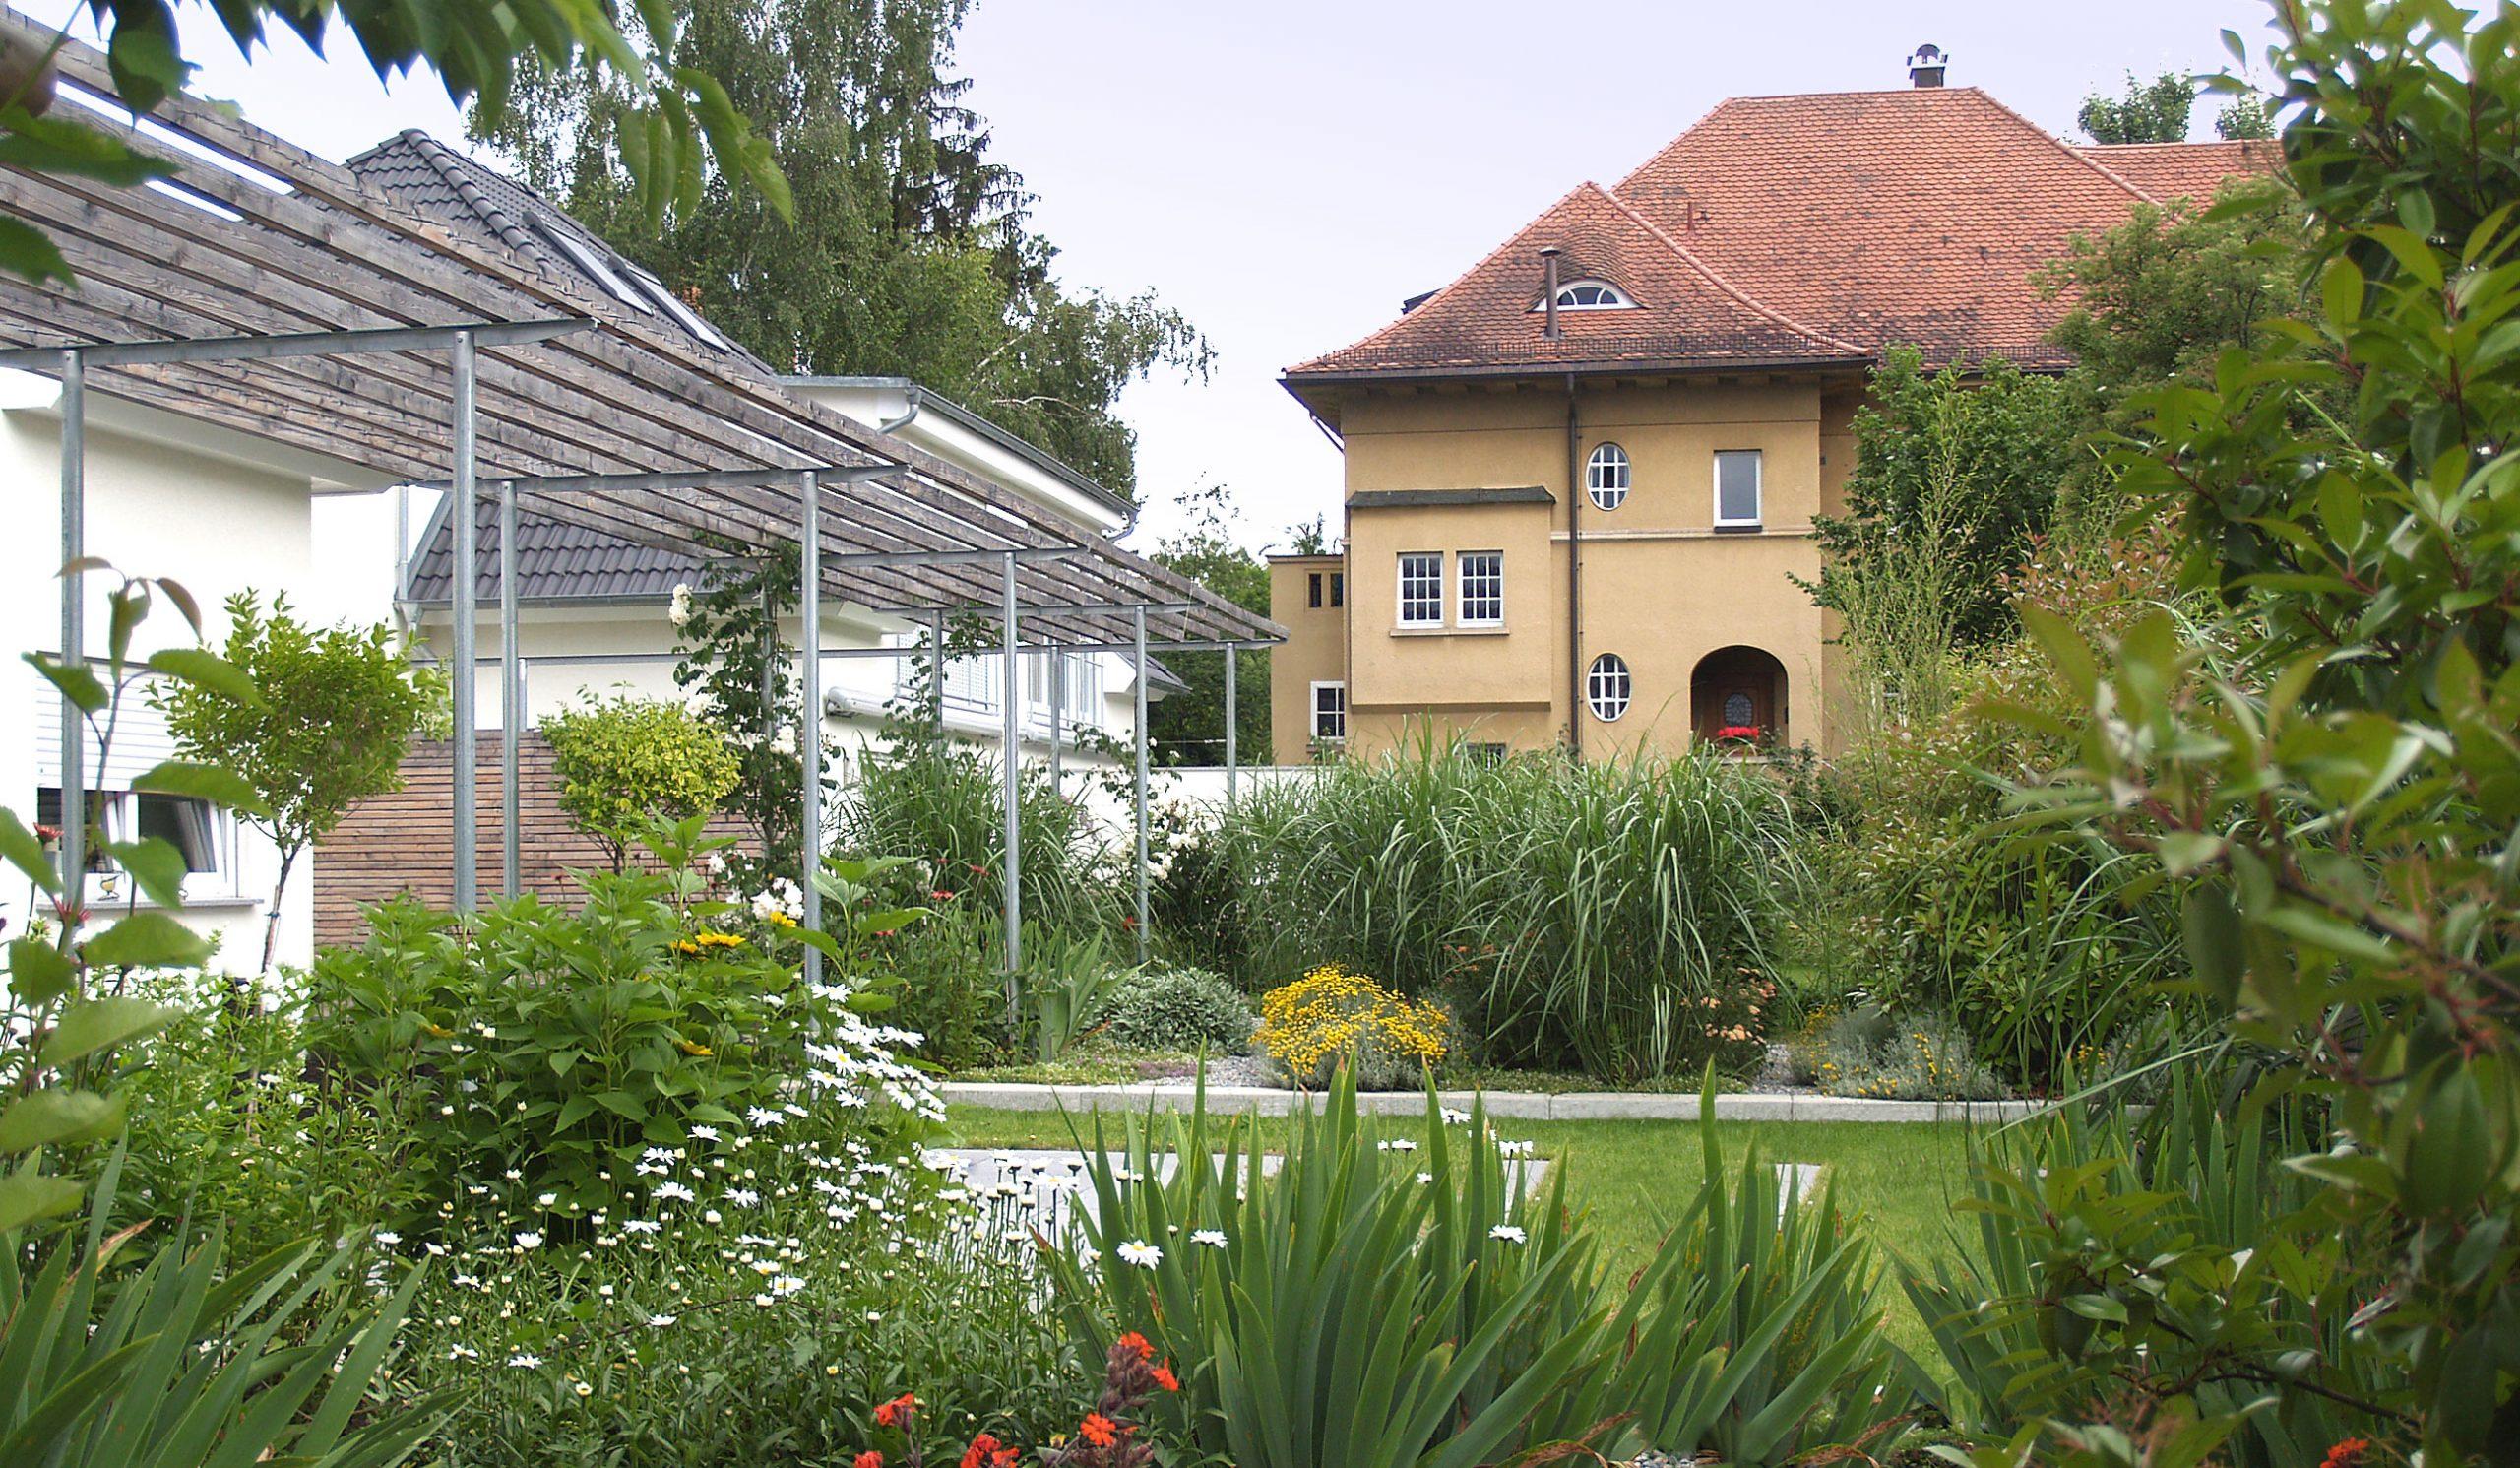 Stahl-Pergola Gartengestaltung Esslingen Nürtingen Reutlingen ...